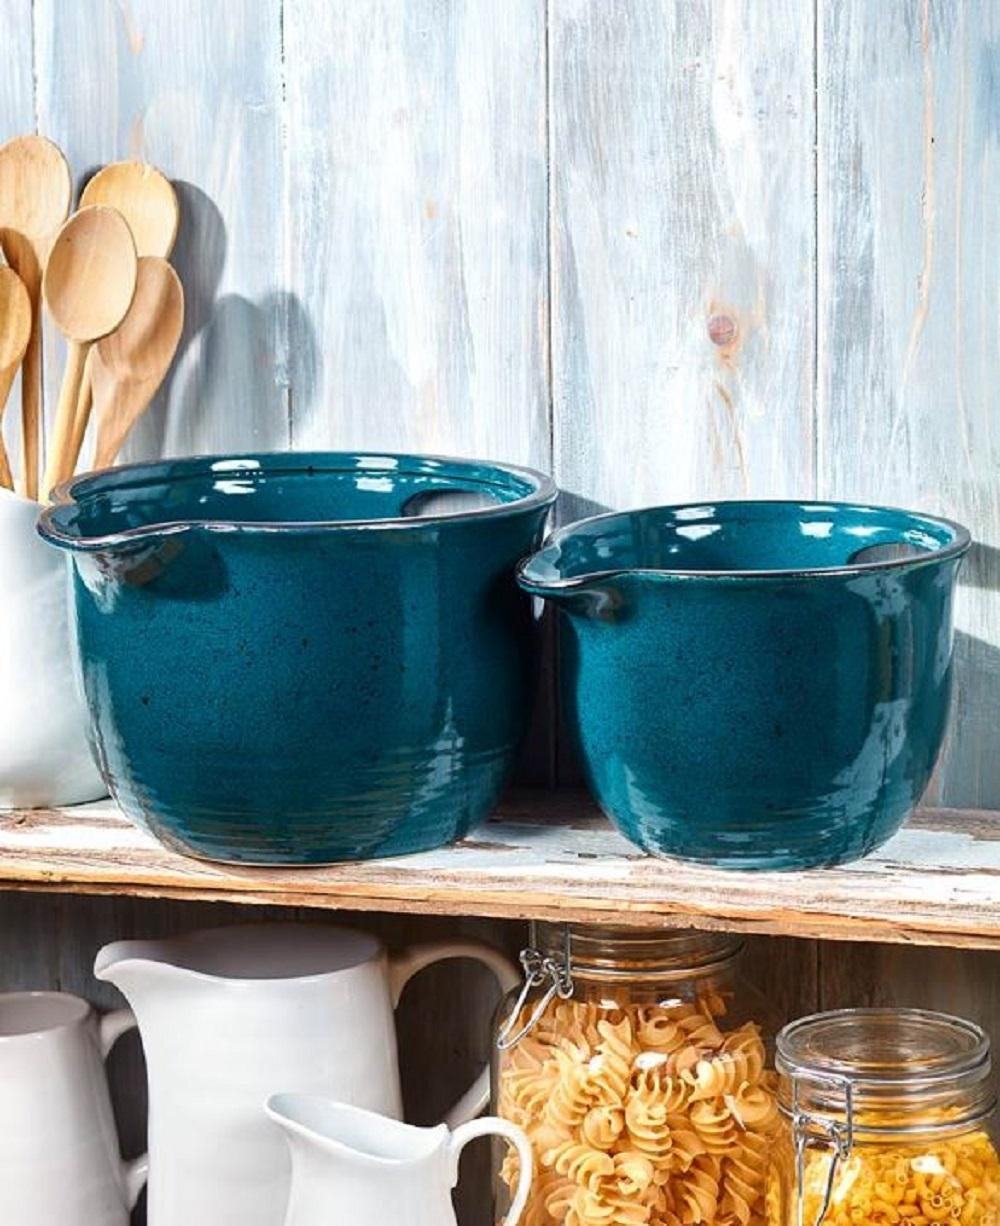 Pouring bowls blue